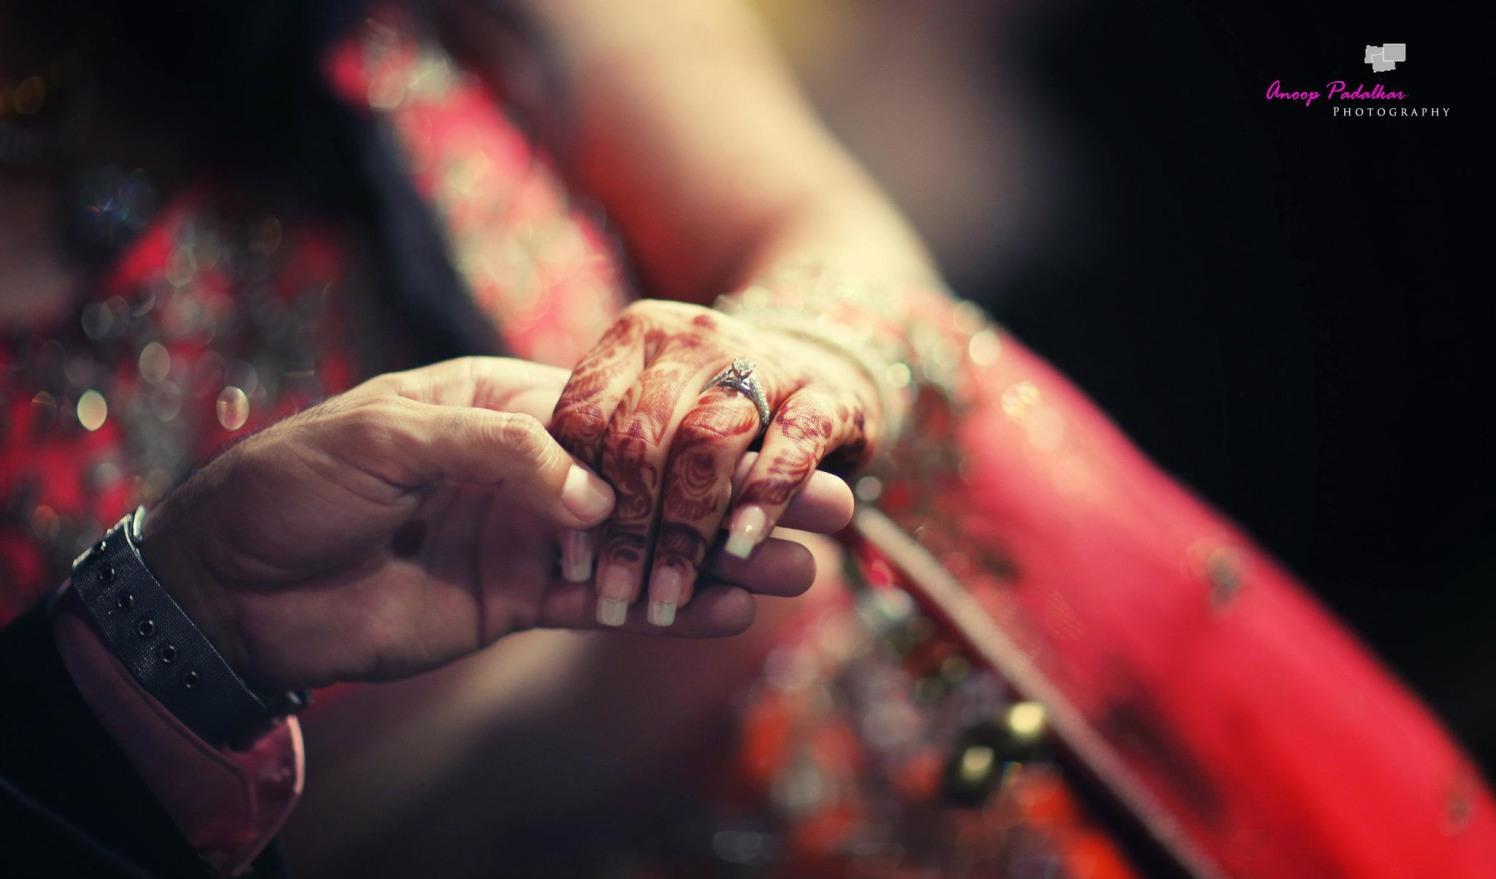 A promise of eternity by Wedding Krafter Wedding-photography | Weddings Photos & Ideas